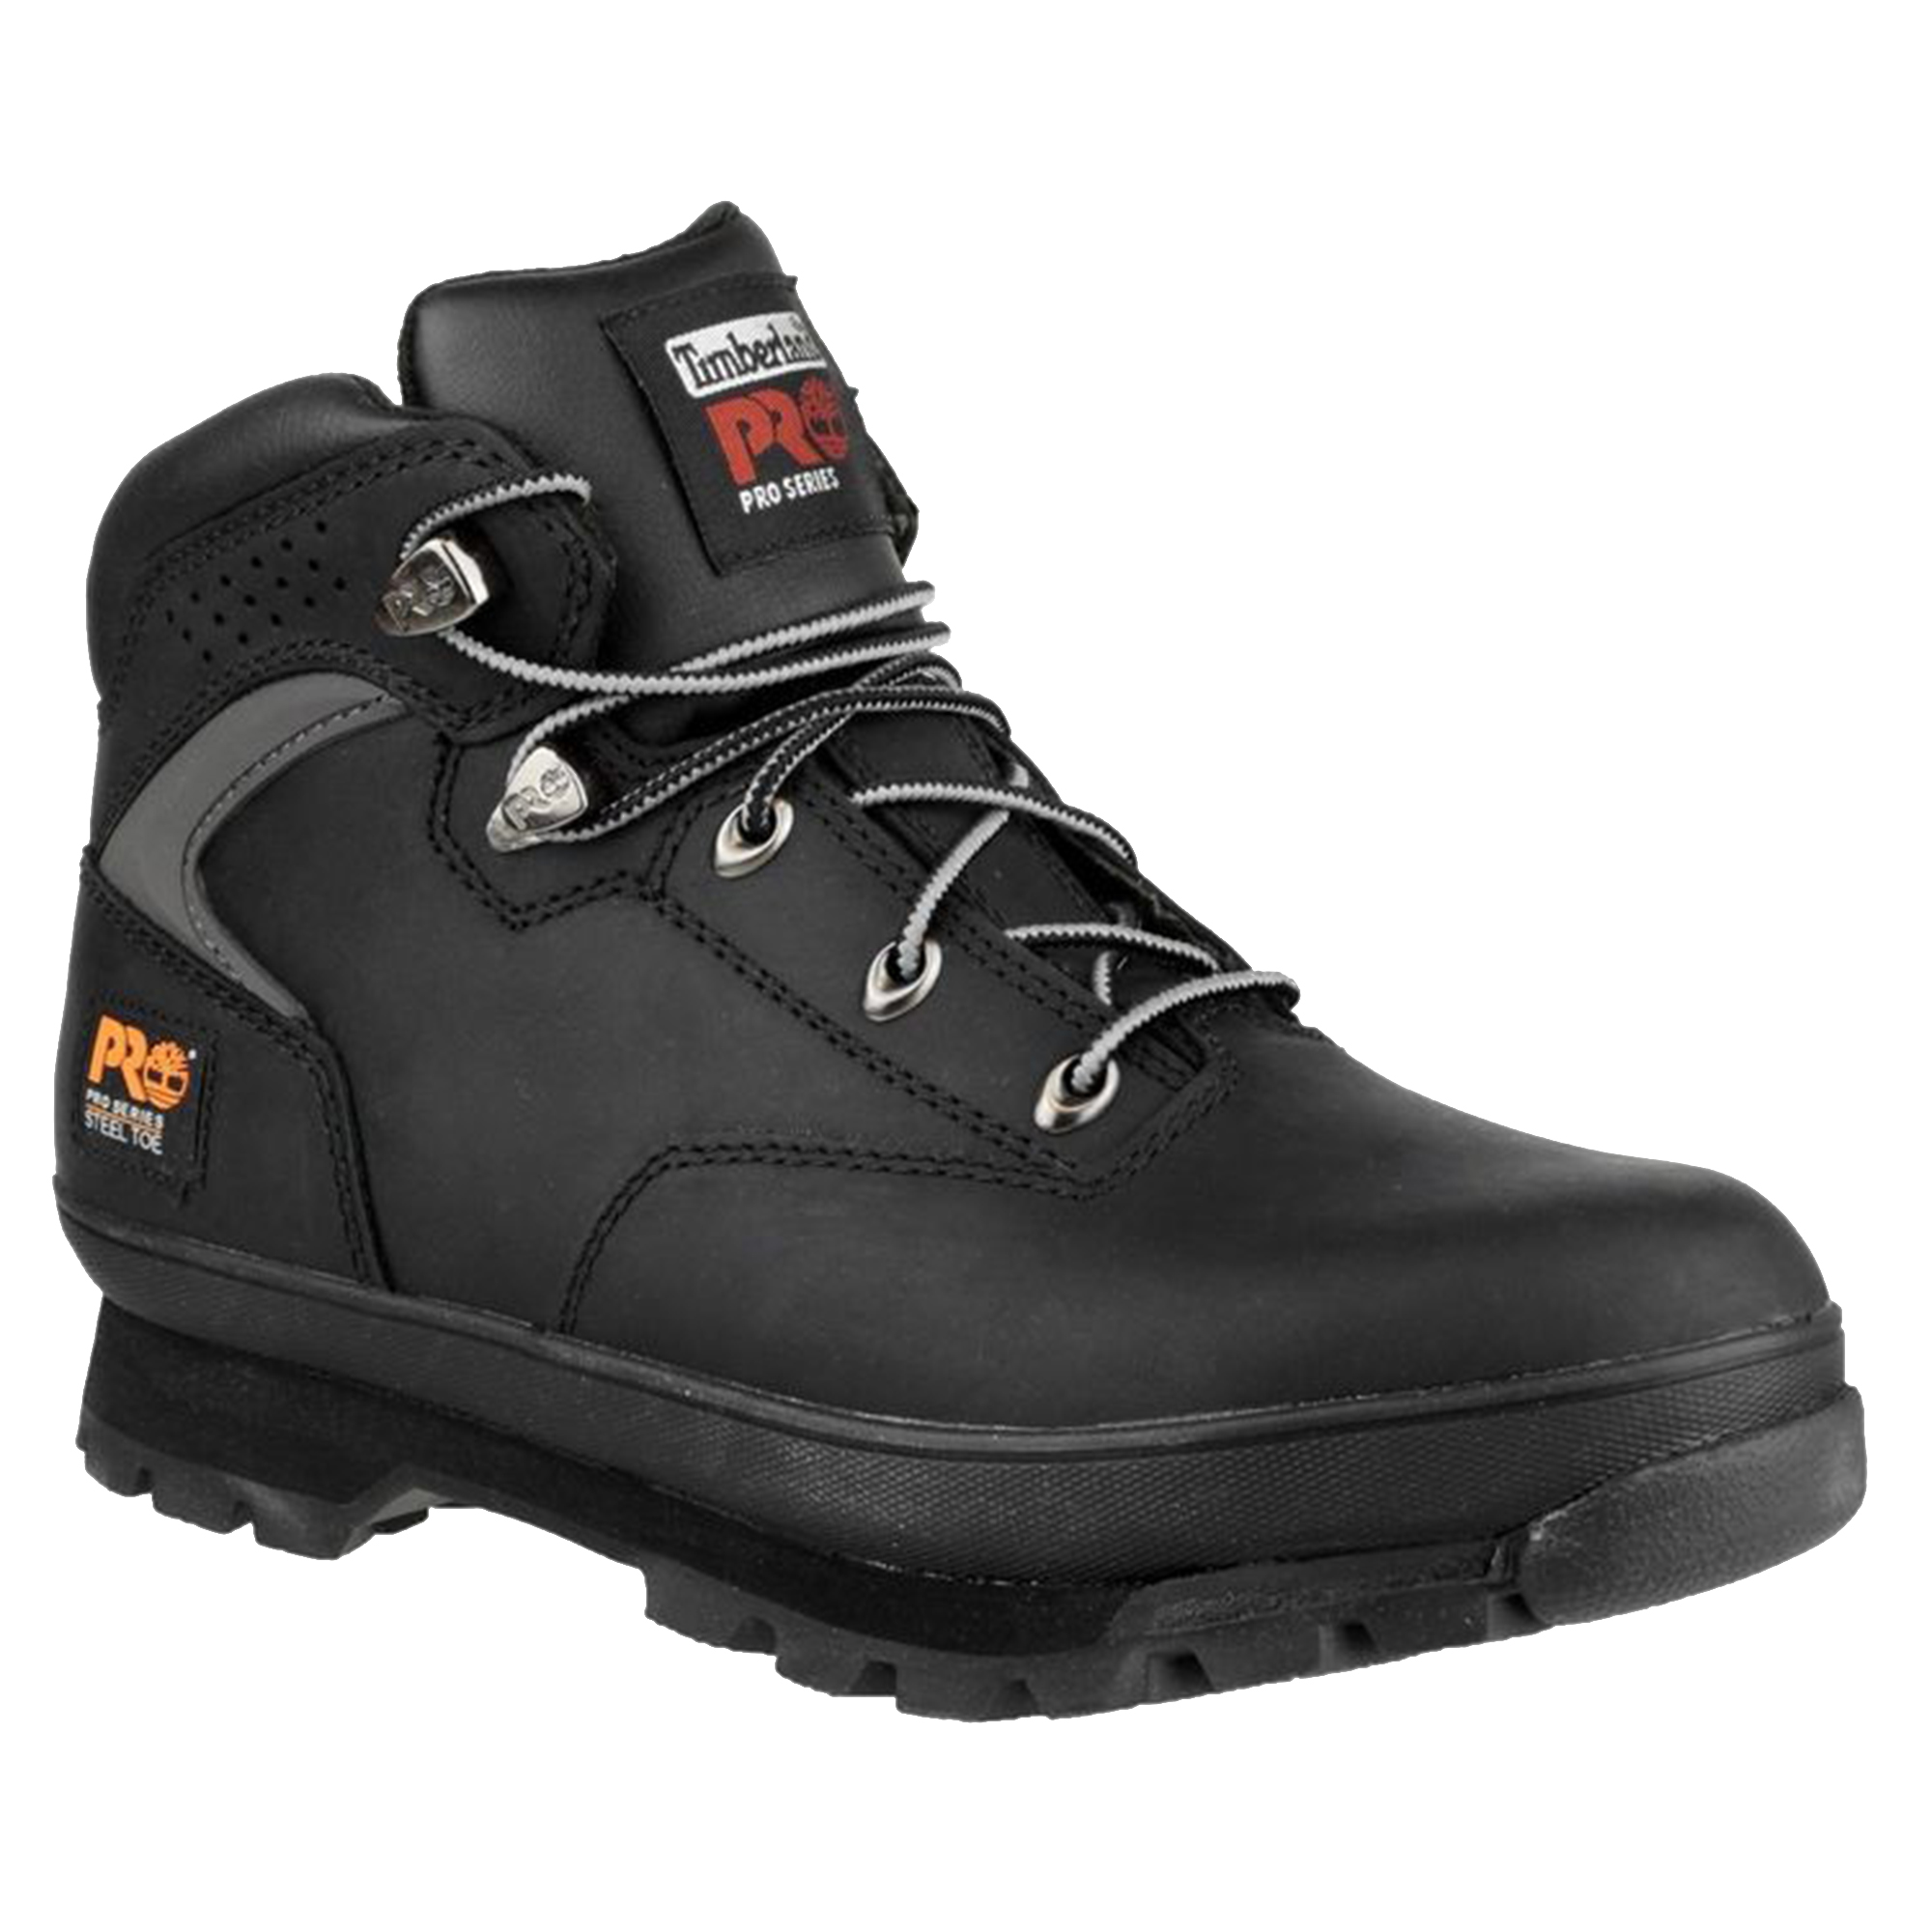 Timberland Pro Mens Euro Hiker Lace Up Safety Boots (6.5 UK) (Black)